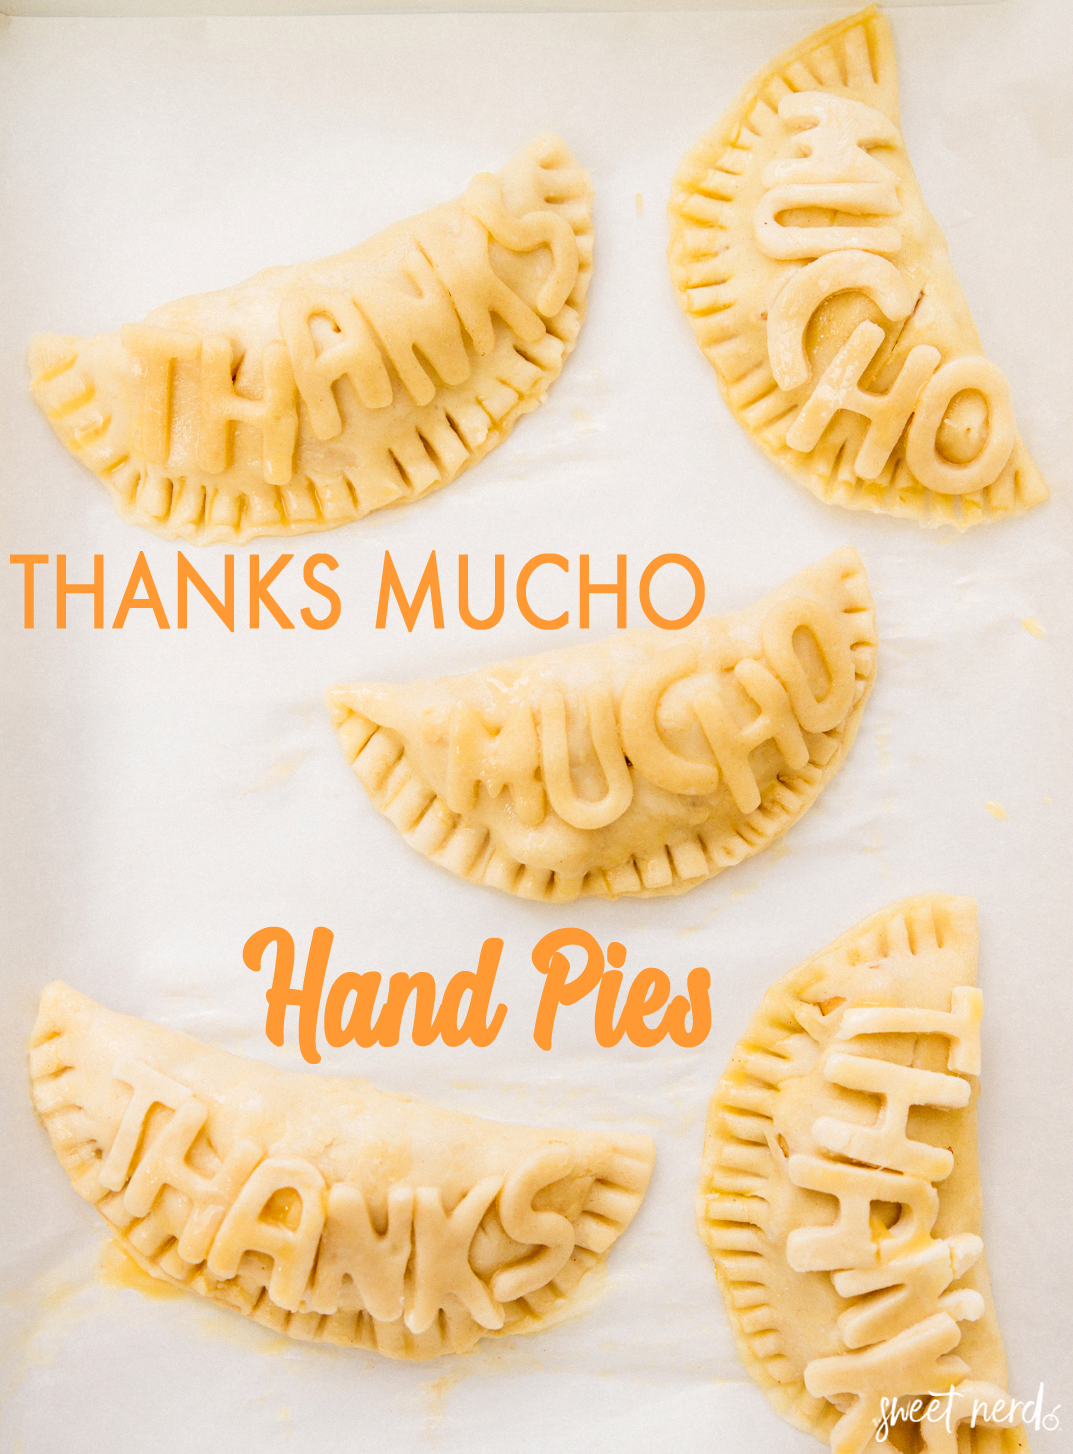 Hand Pies with Gratitude